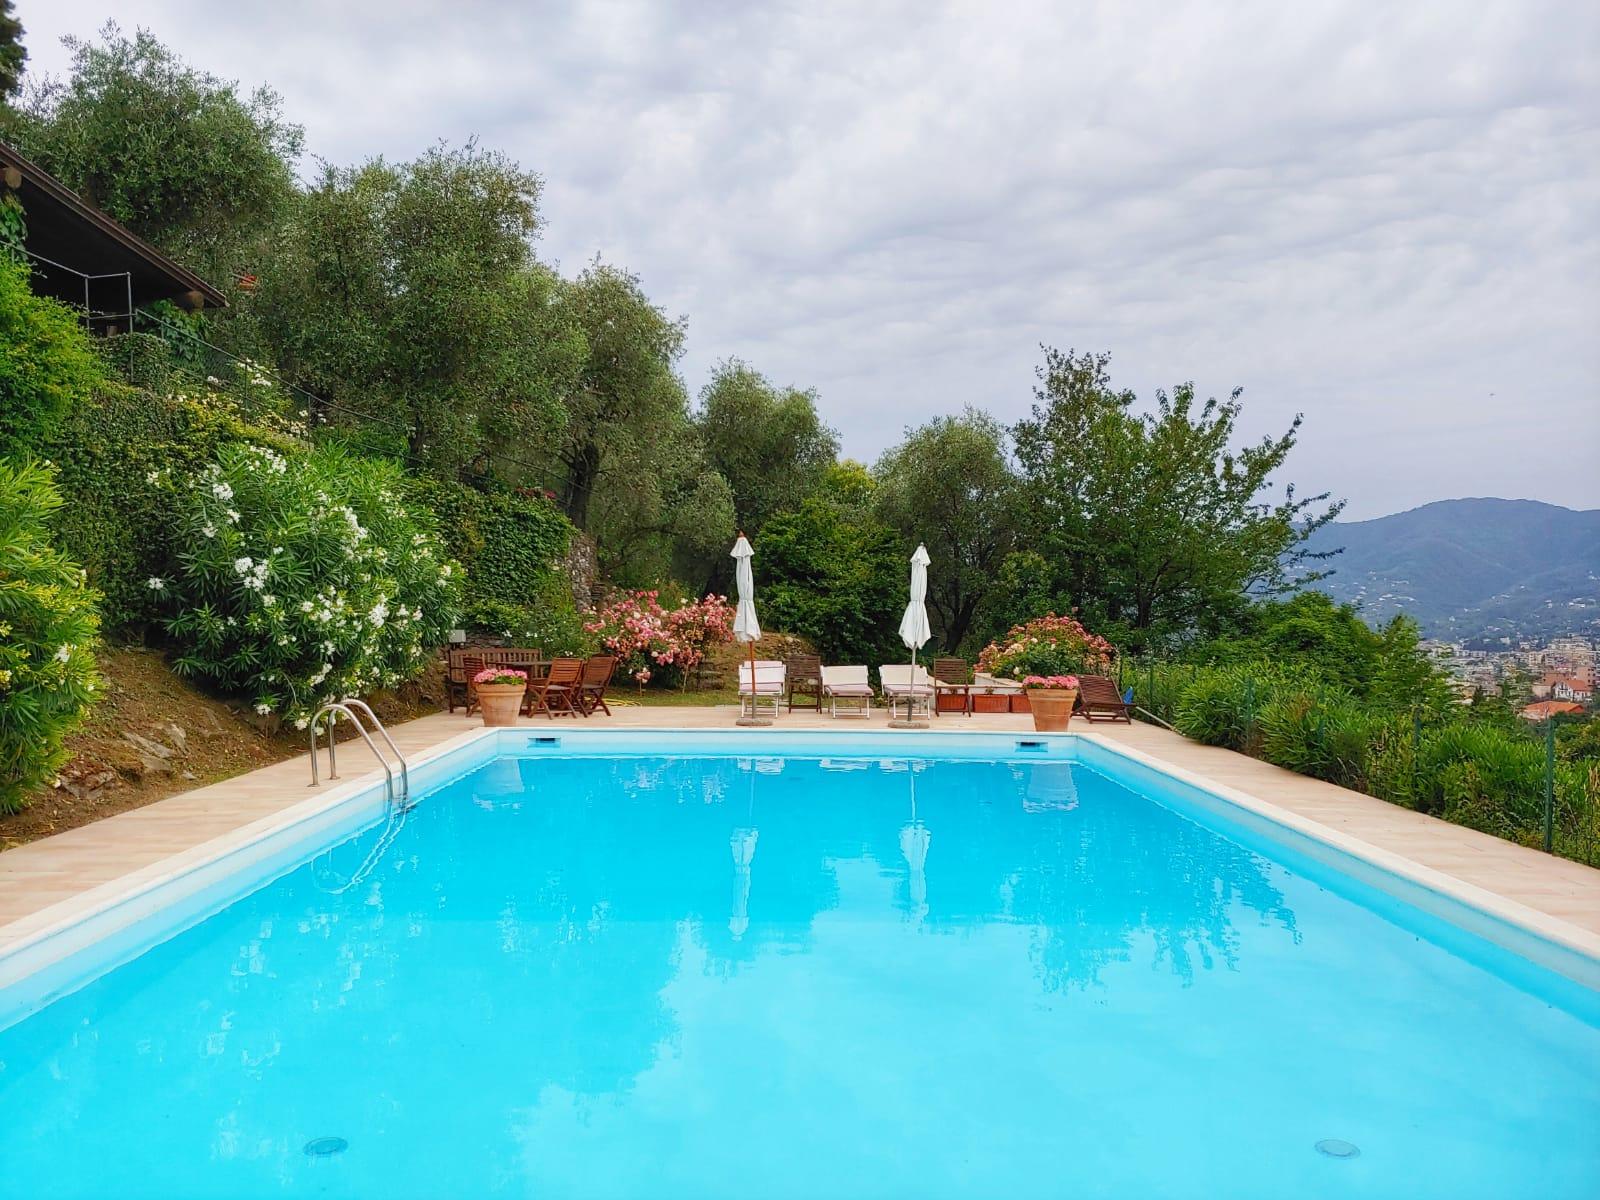 Apartment Hintown Villa Diana Garden Suite with SwimmingPool photo 18930381